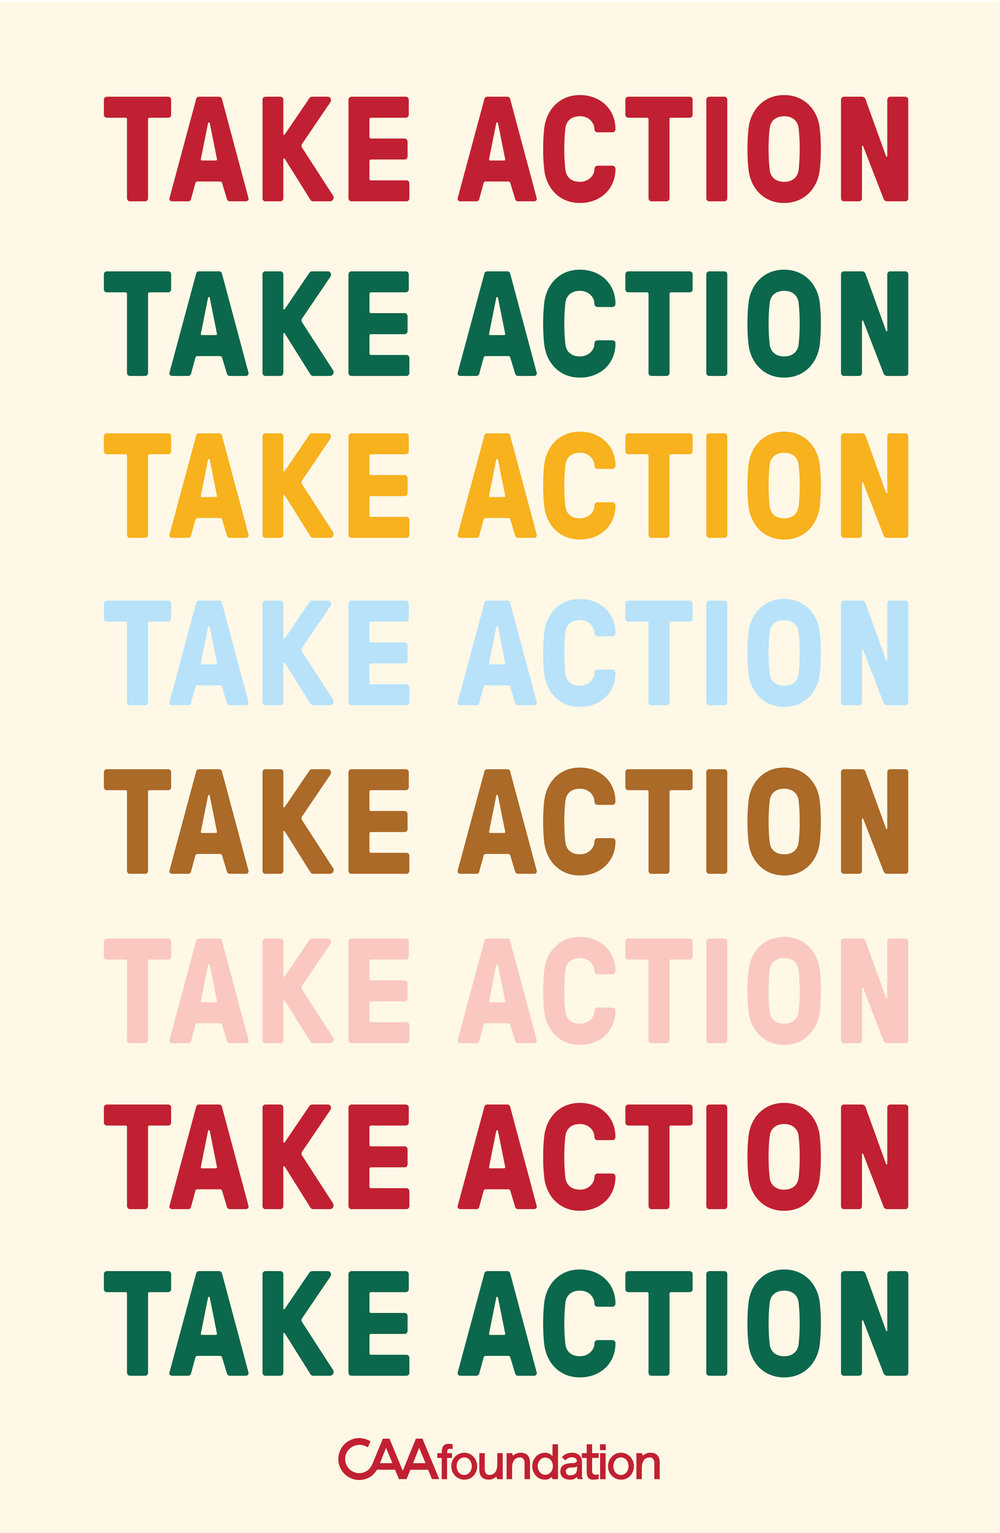 Take_Action_Posters_v5-28.jpg